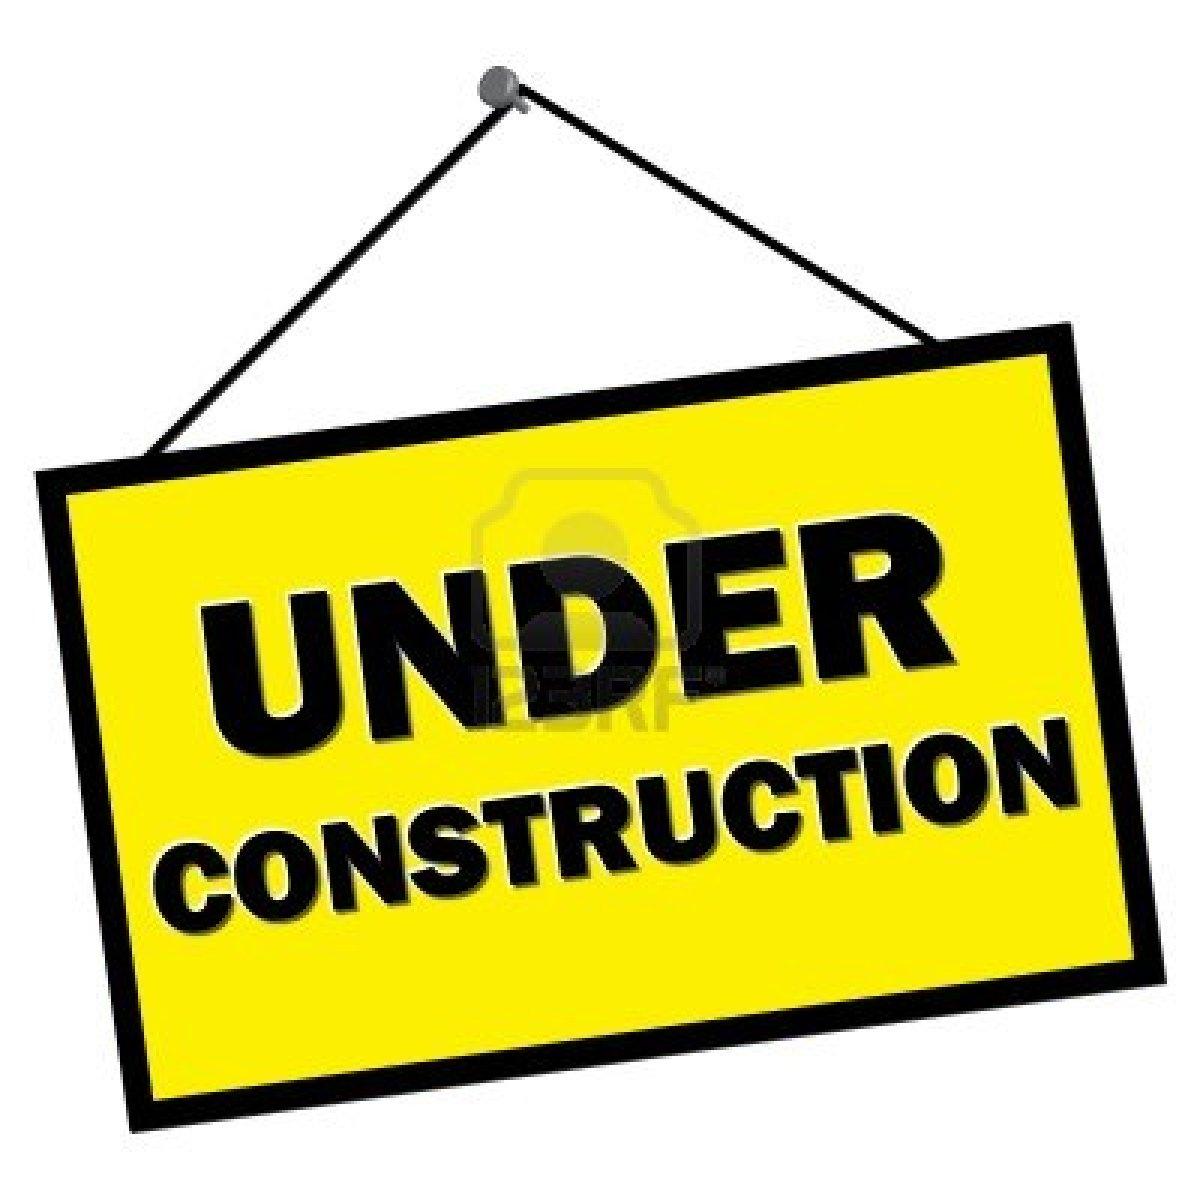 Website Under Construction Image.